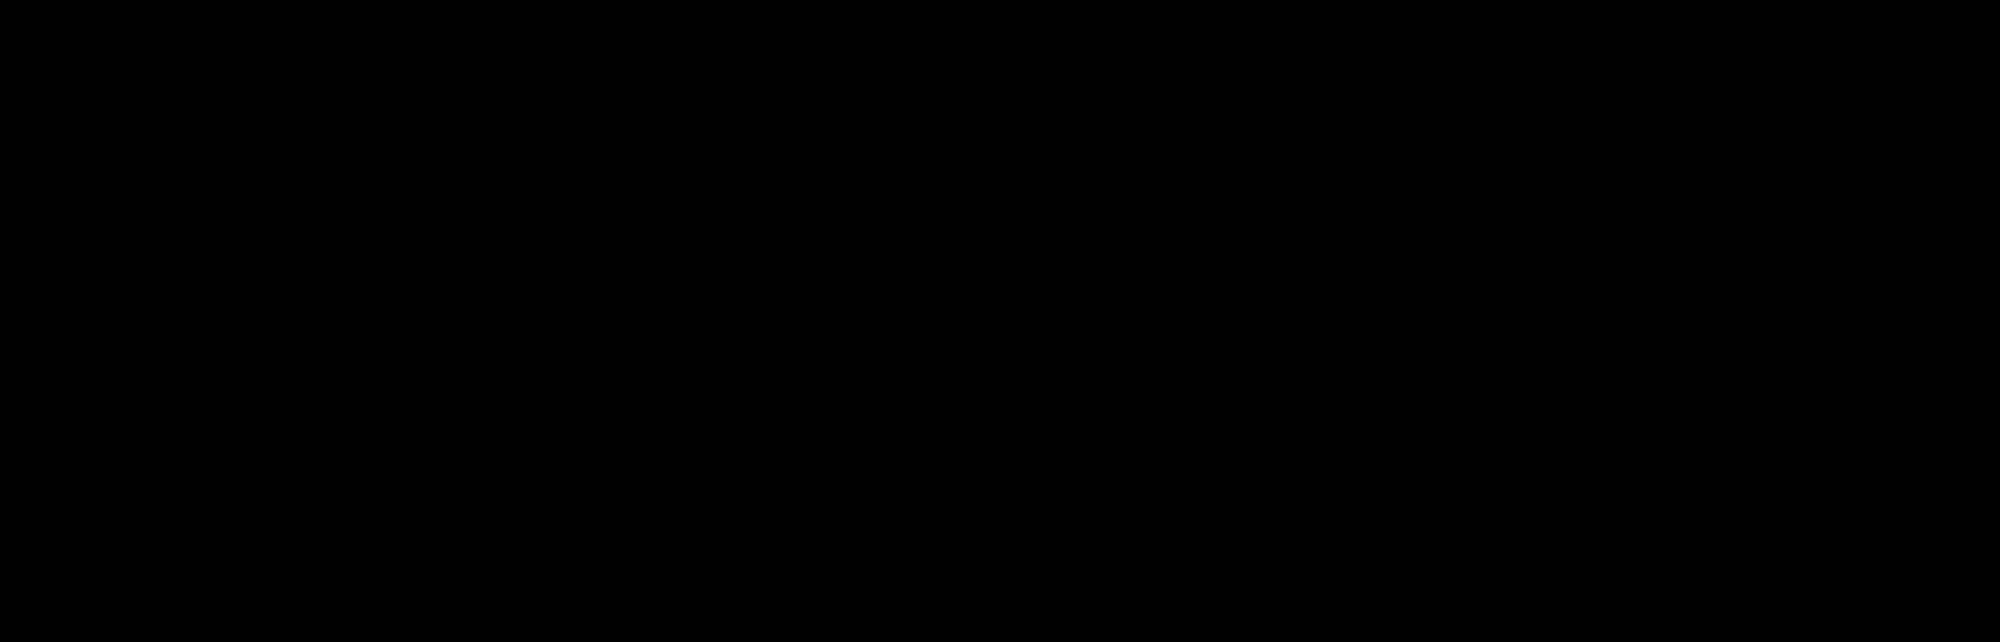 Southern Law Center PL logo